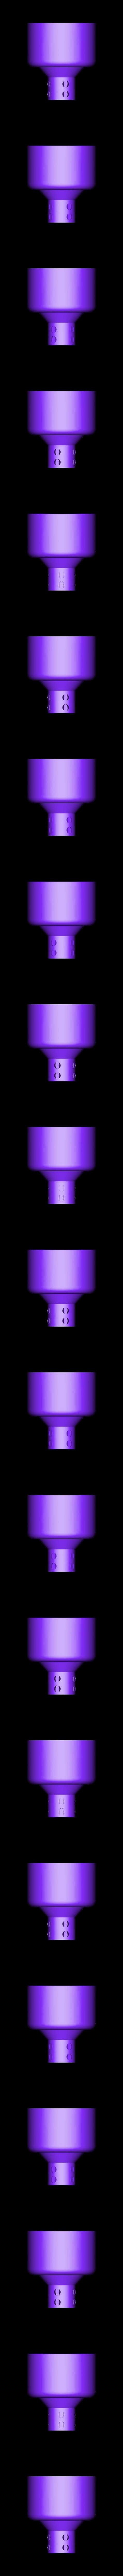 Pot_Inner_v4.stl Download STL file Hydroponic Pot • Template to 3D print, Eve